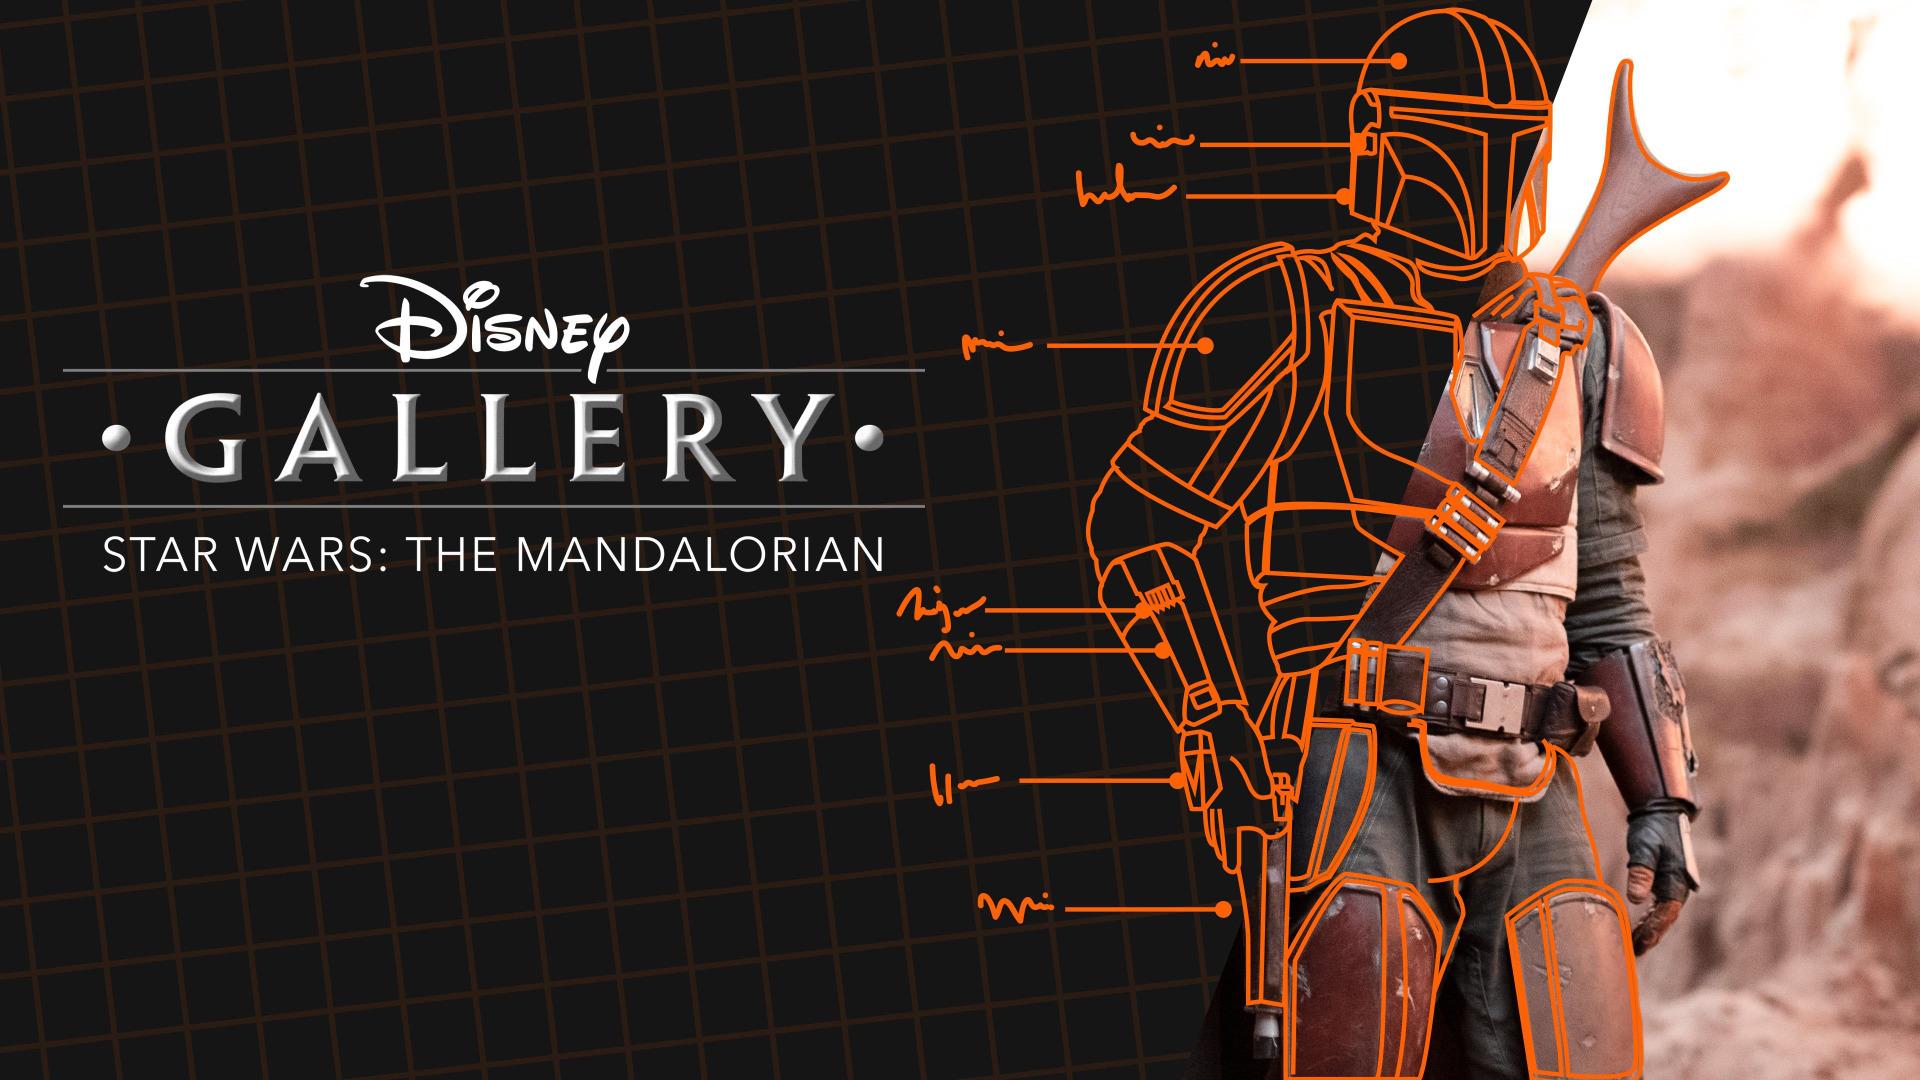 Show Disney Gallery: The Mandalorian